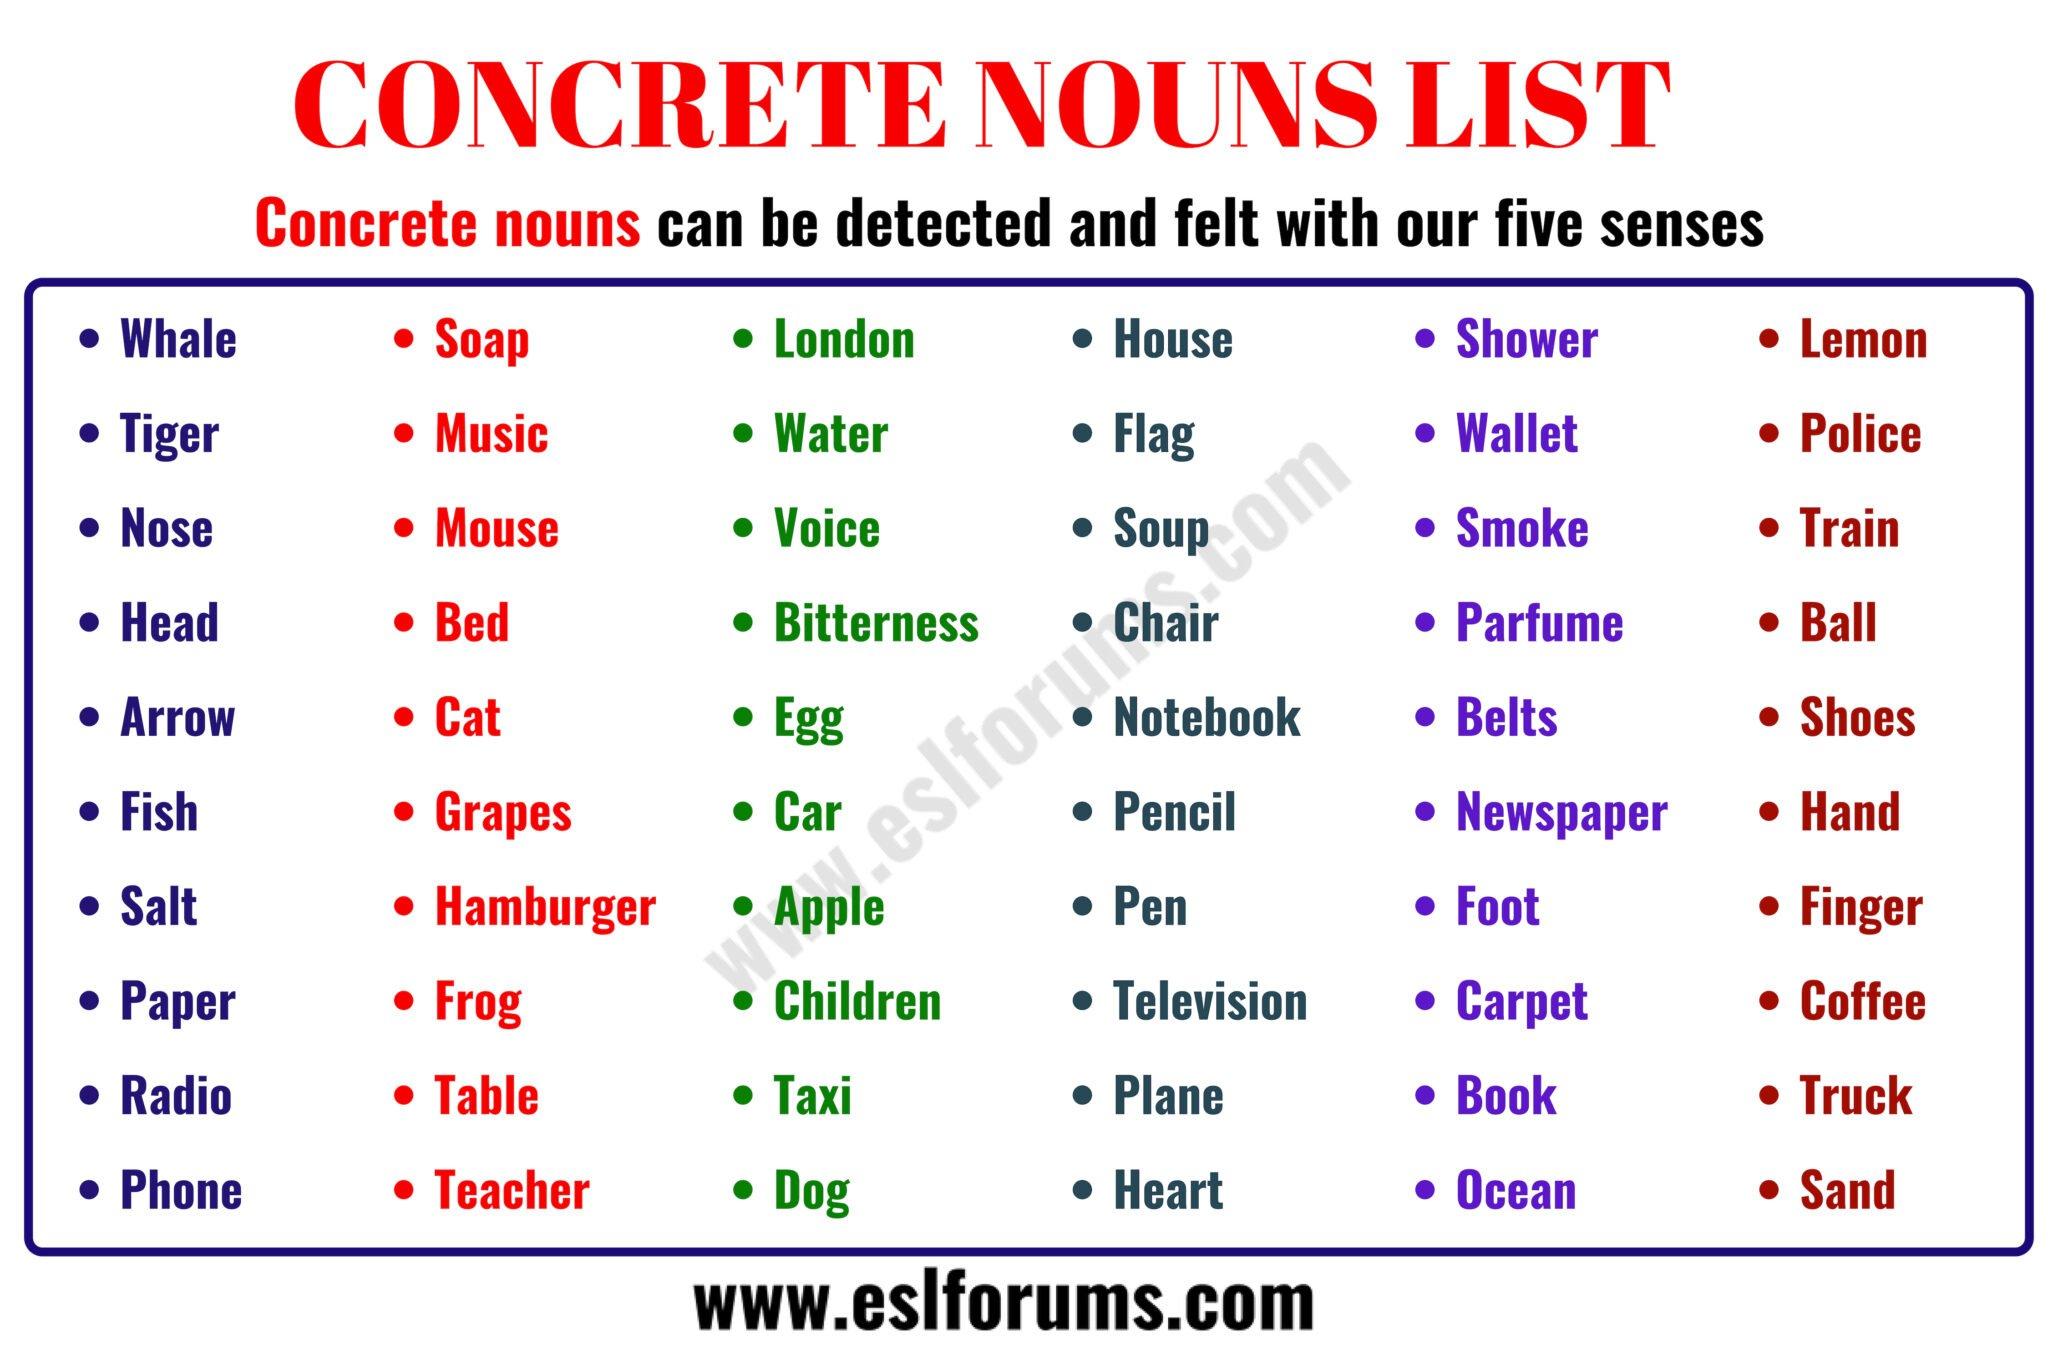 Concrete Noun: Important List of 60 Common Concrete Nouns in English